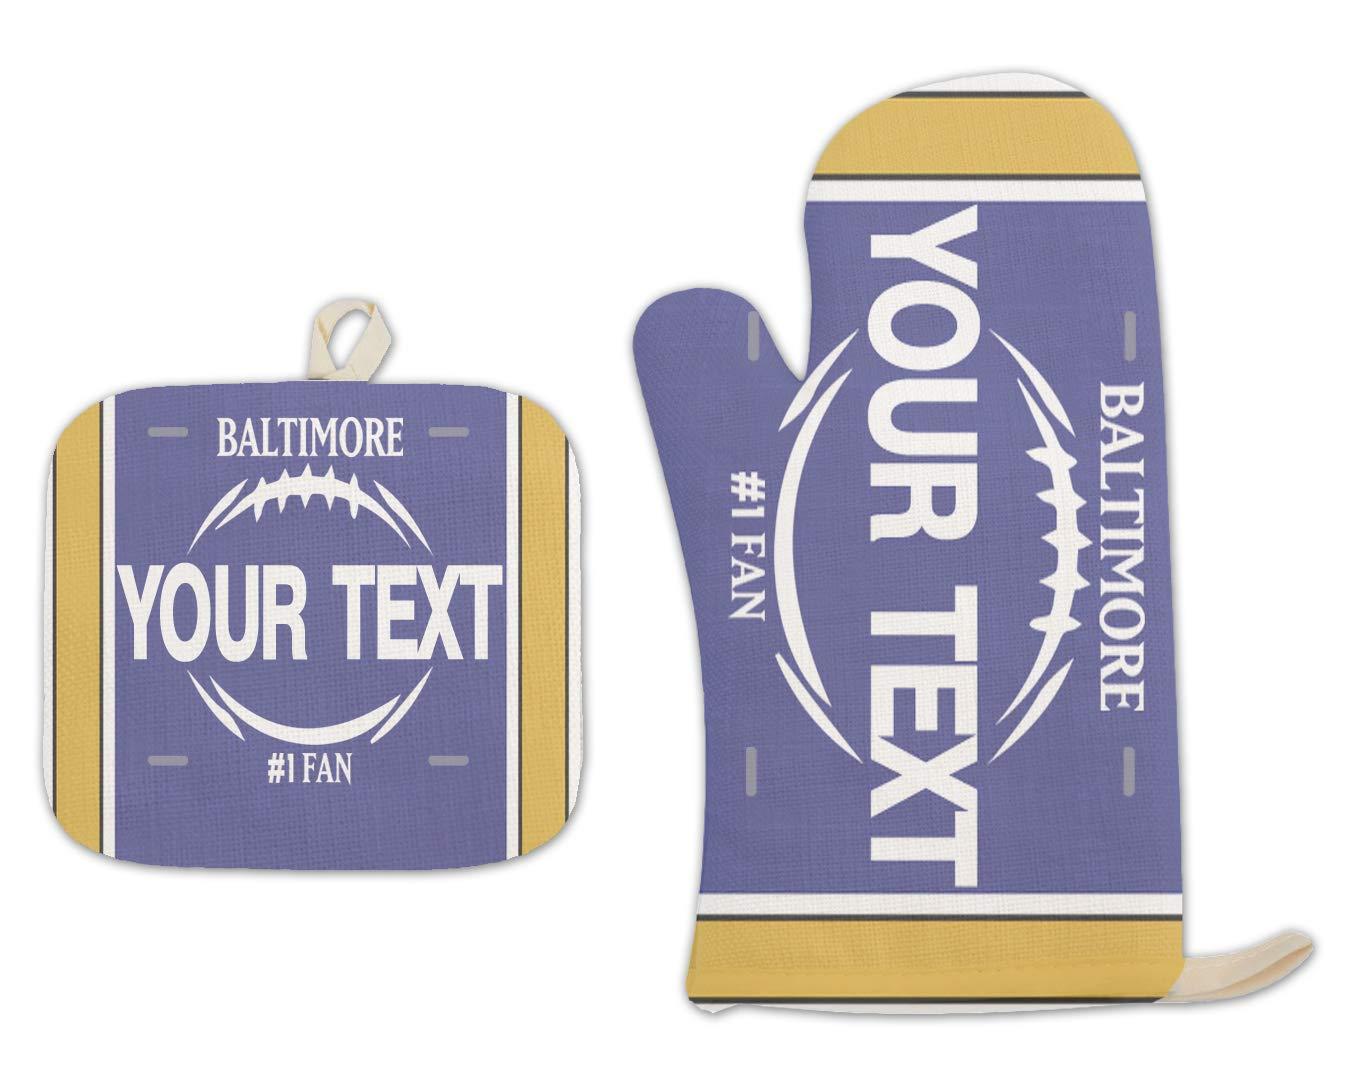 Bleu Reign BRGiftShop Personalized Custom Name Football Team Baltimore Linen Oven Mitt and Potholder Set